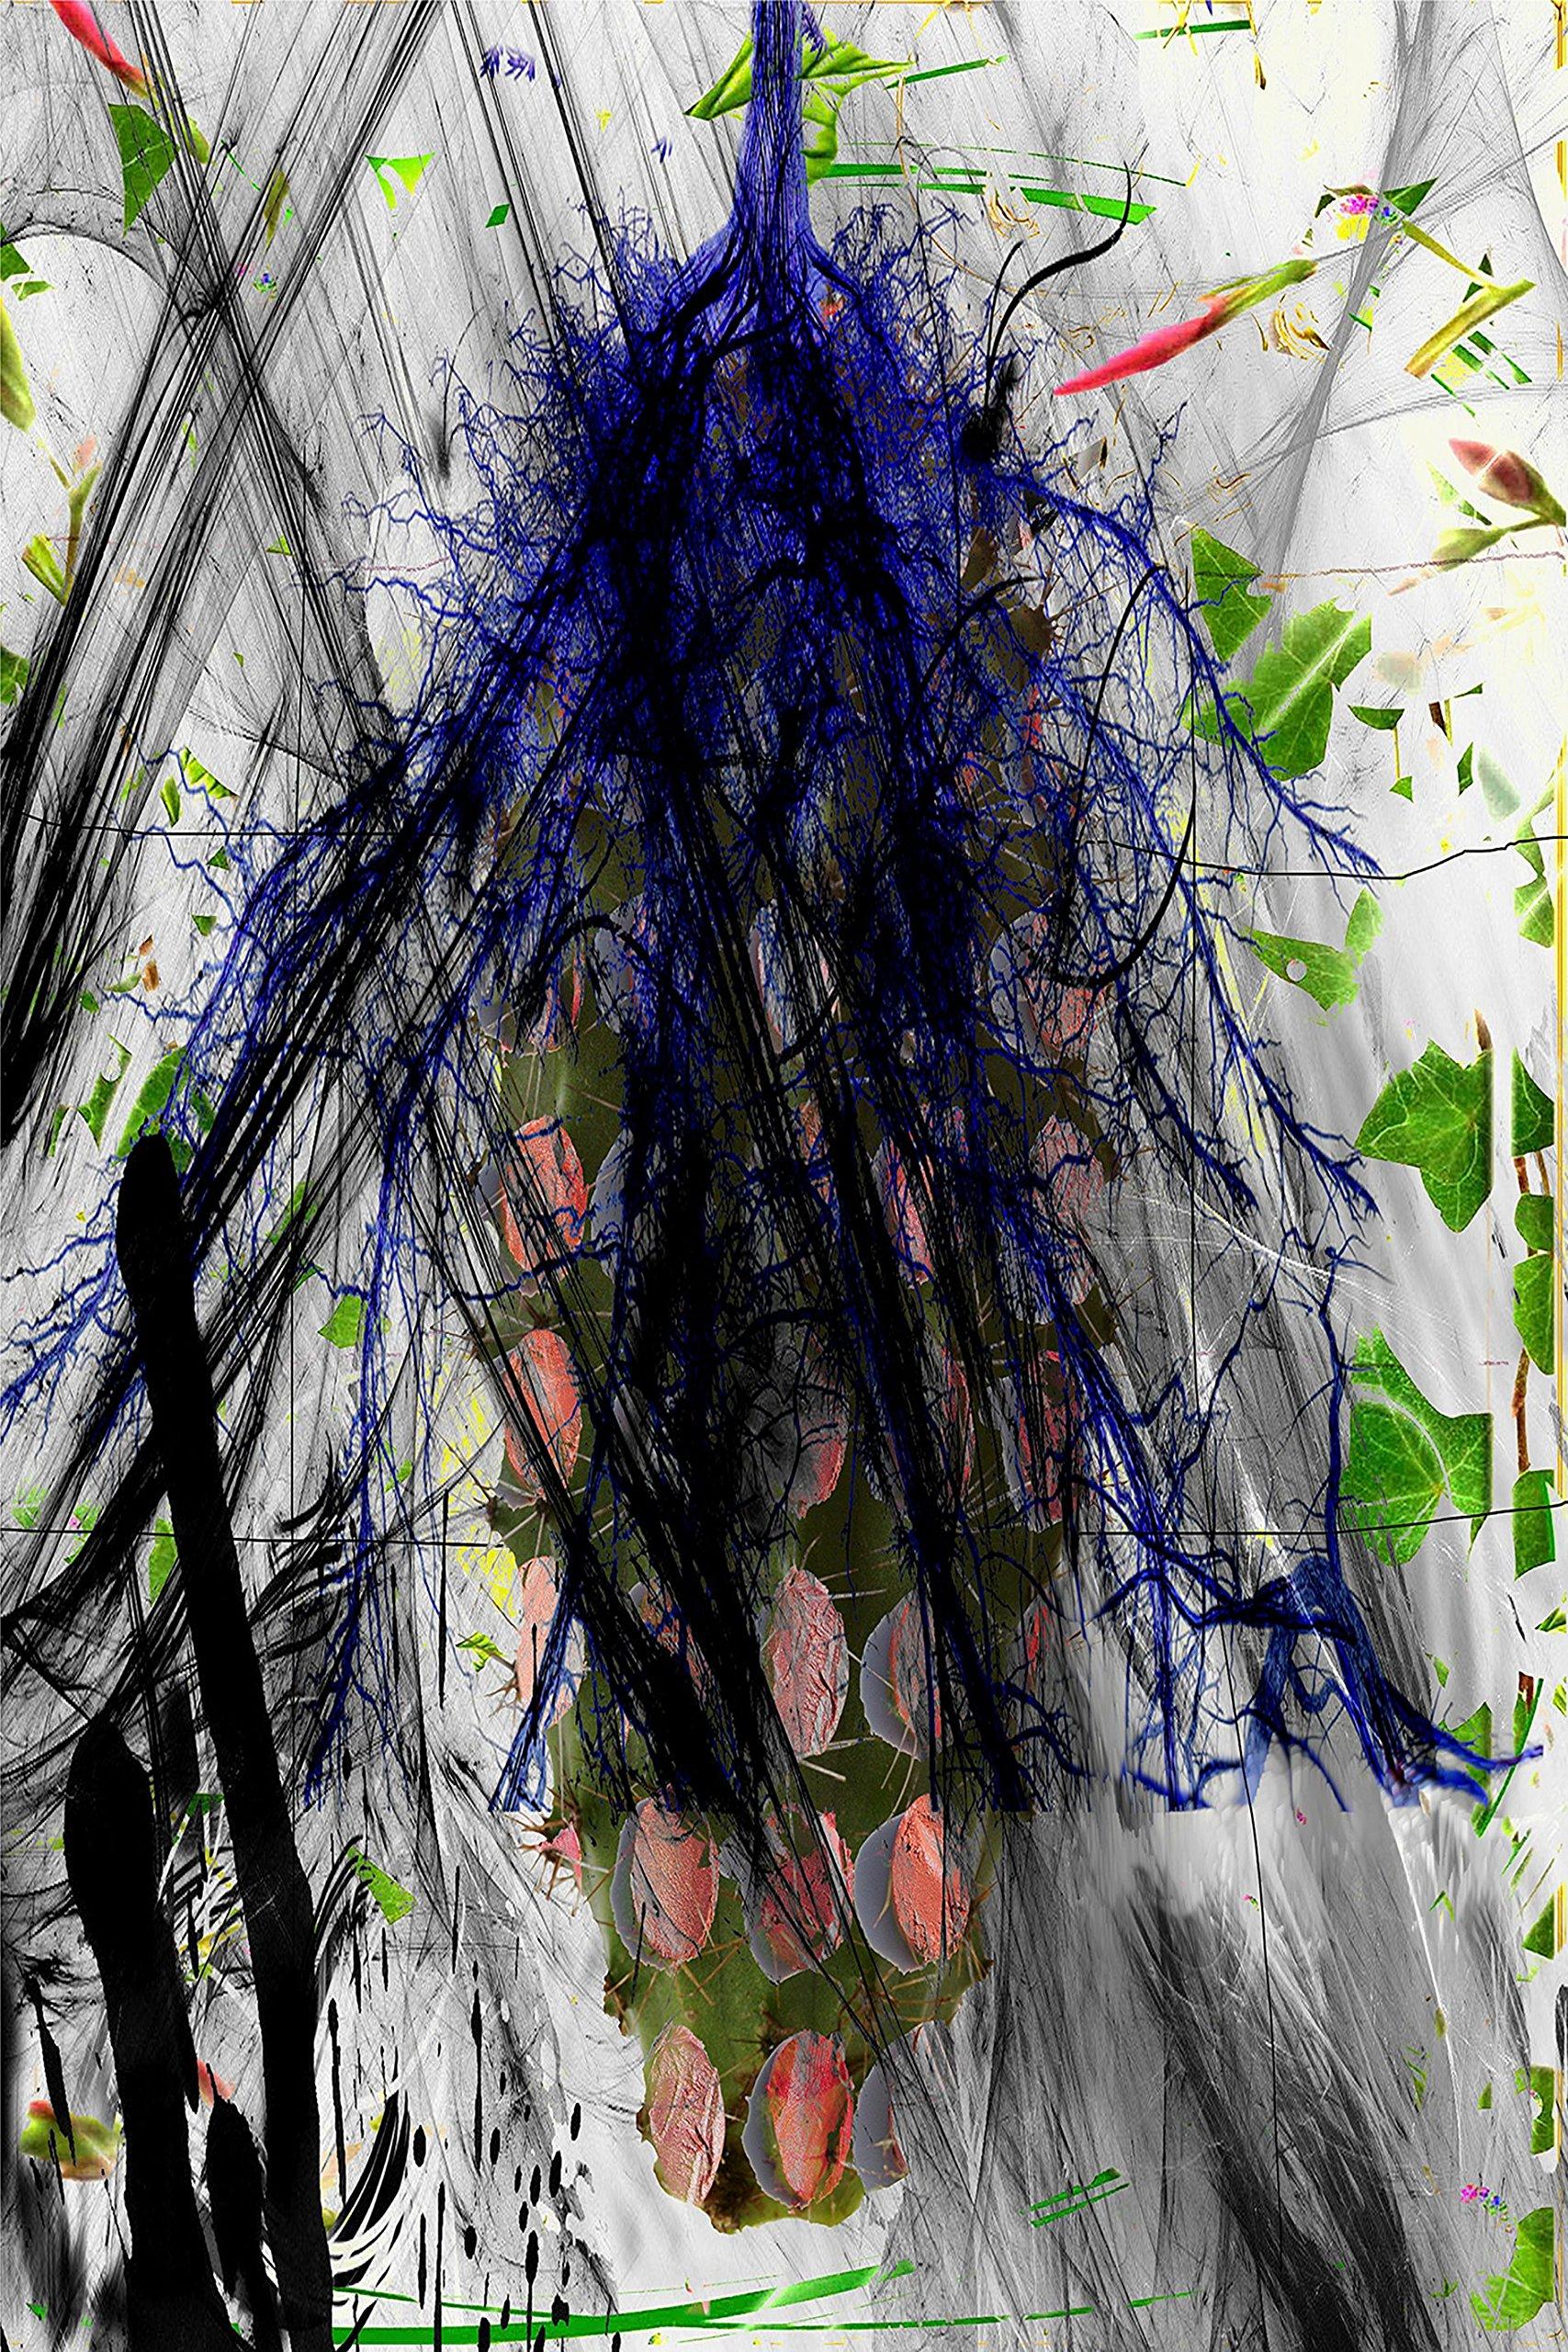 abstract organic XXIV. Dye Sublimation on Alu.